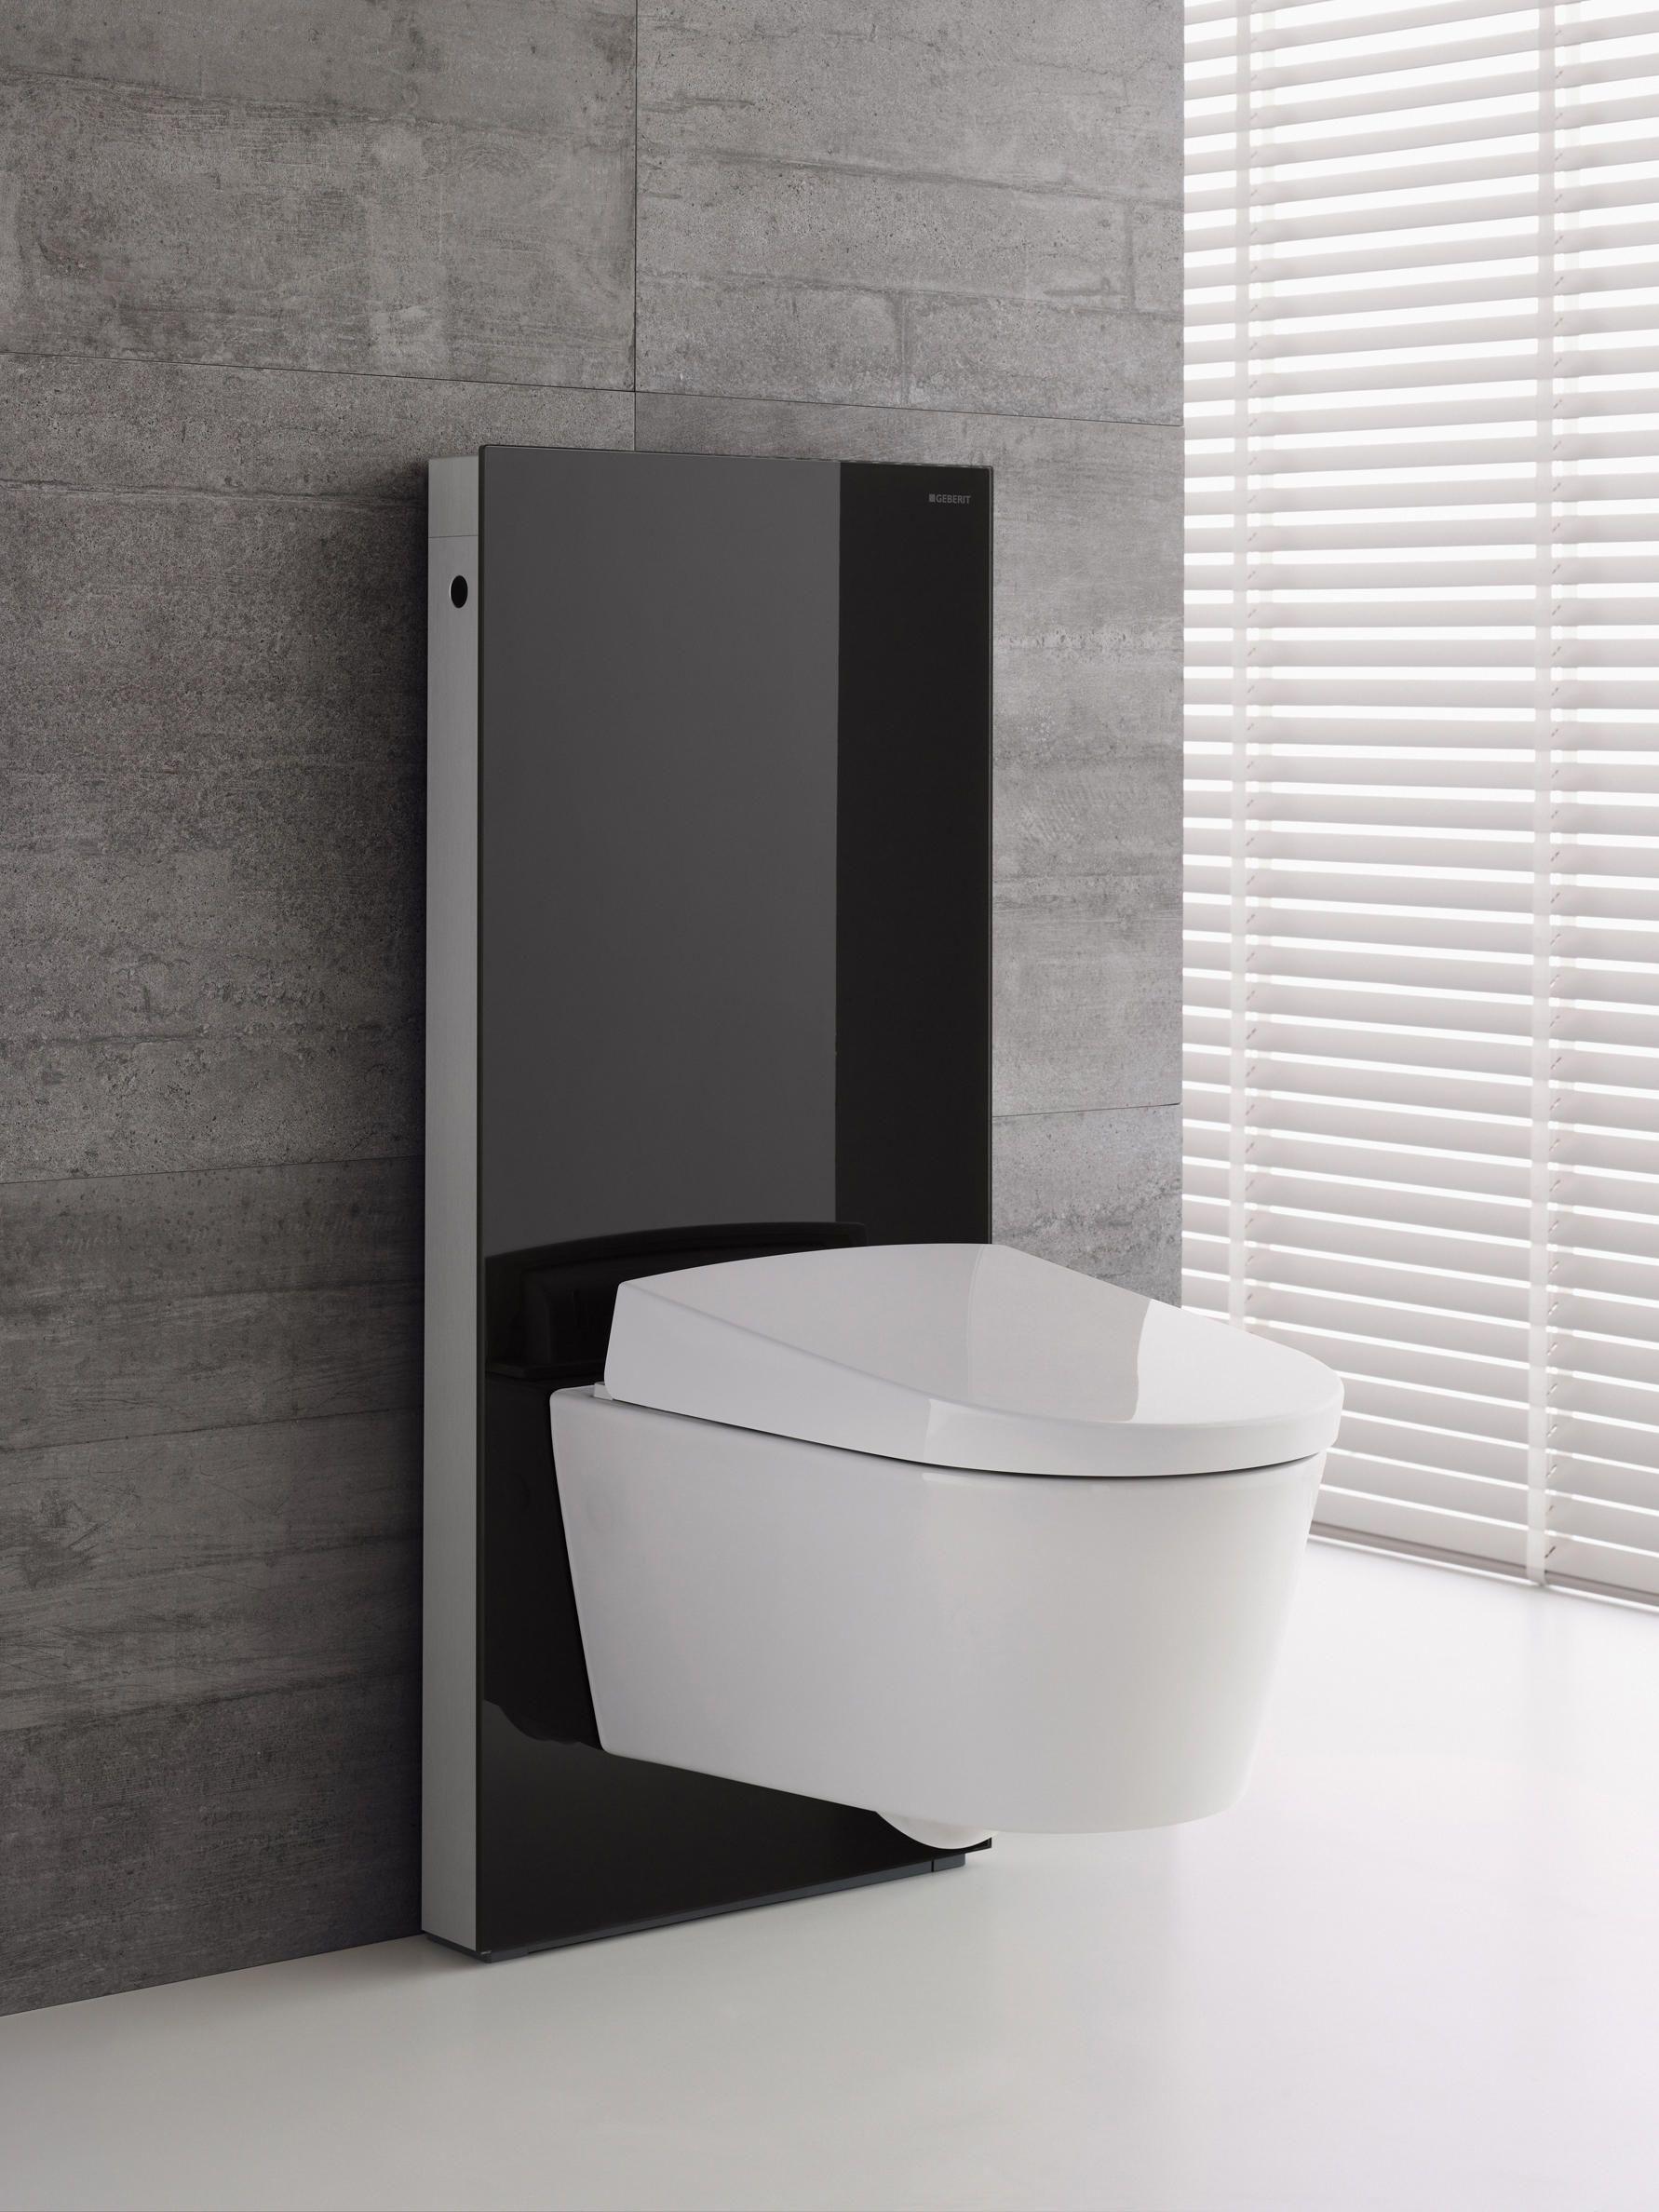 Geberit Monolith Plus By Geberit Small Toilet Room Modern